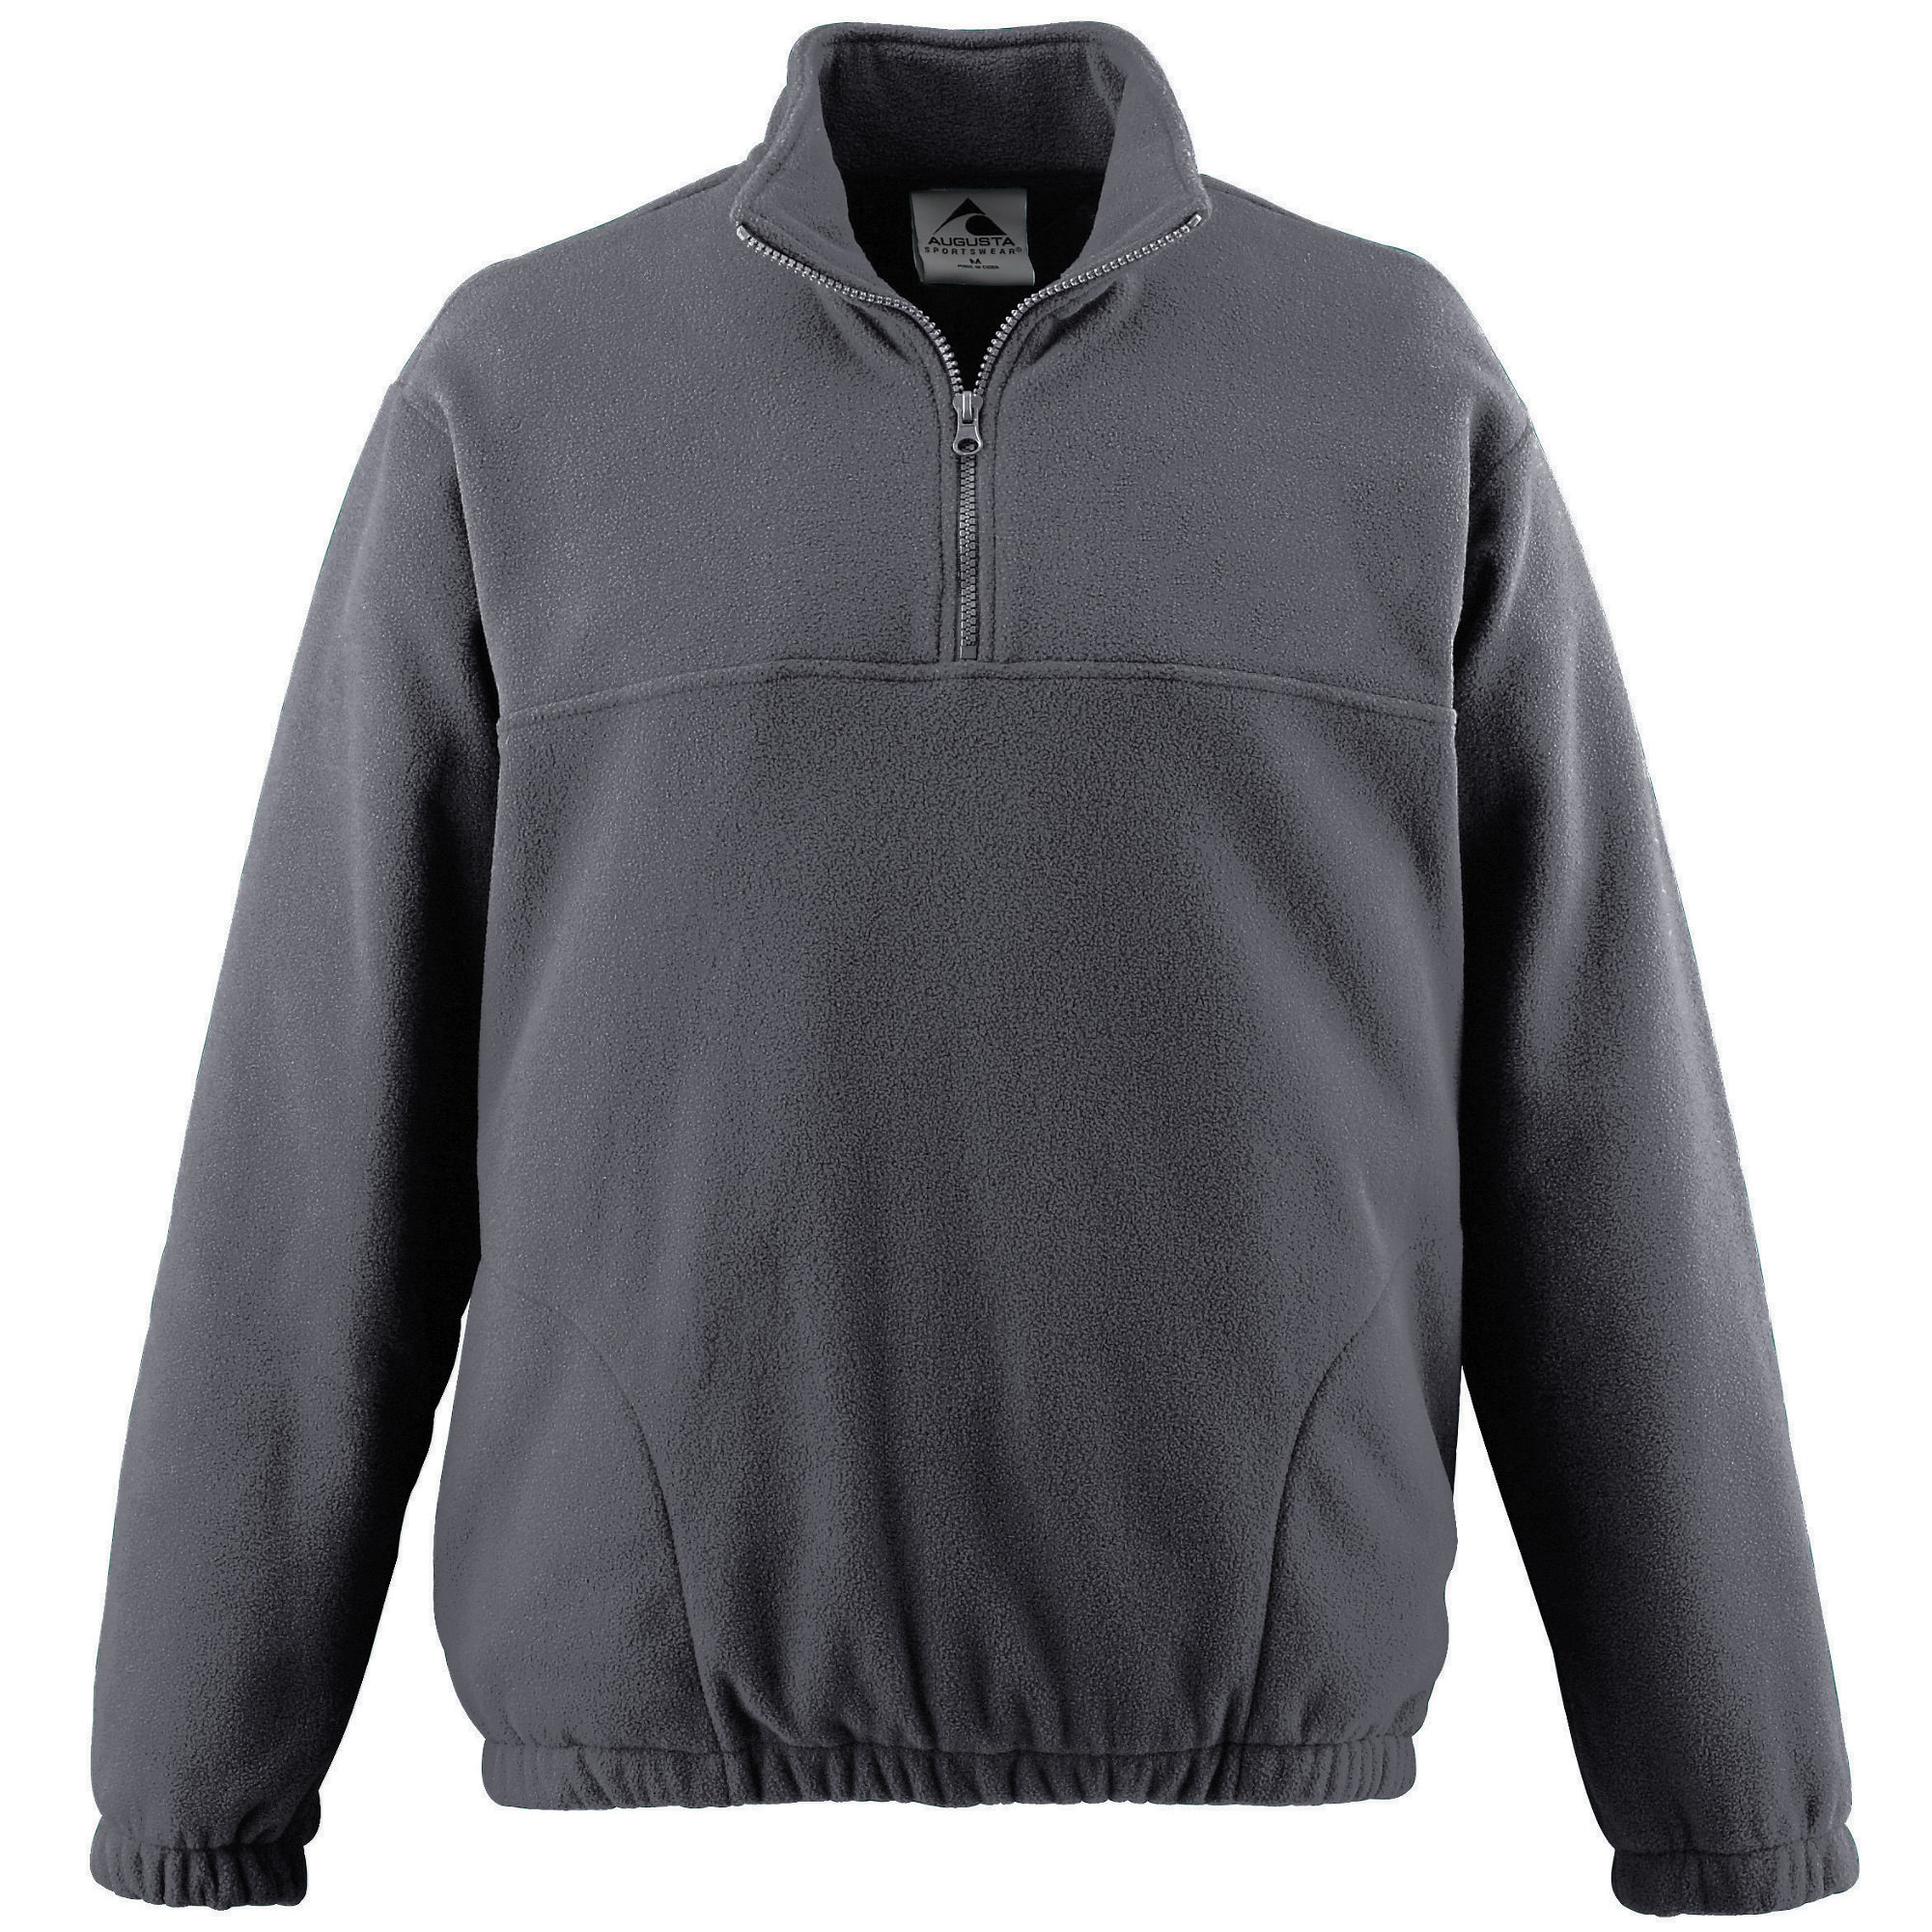 Augusta Sportswear - MEN'S CHILL FLEECE HALF-ZIP PULLOVER | eBay